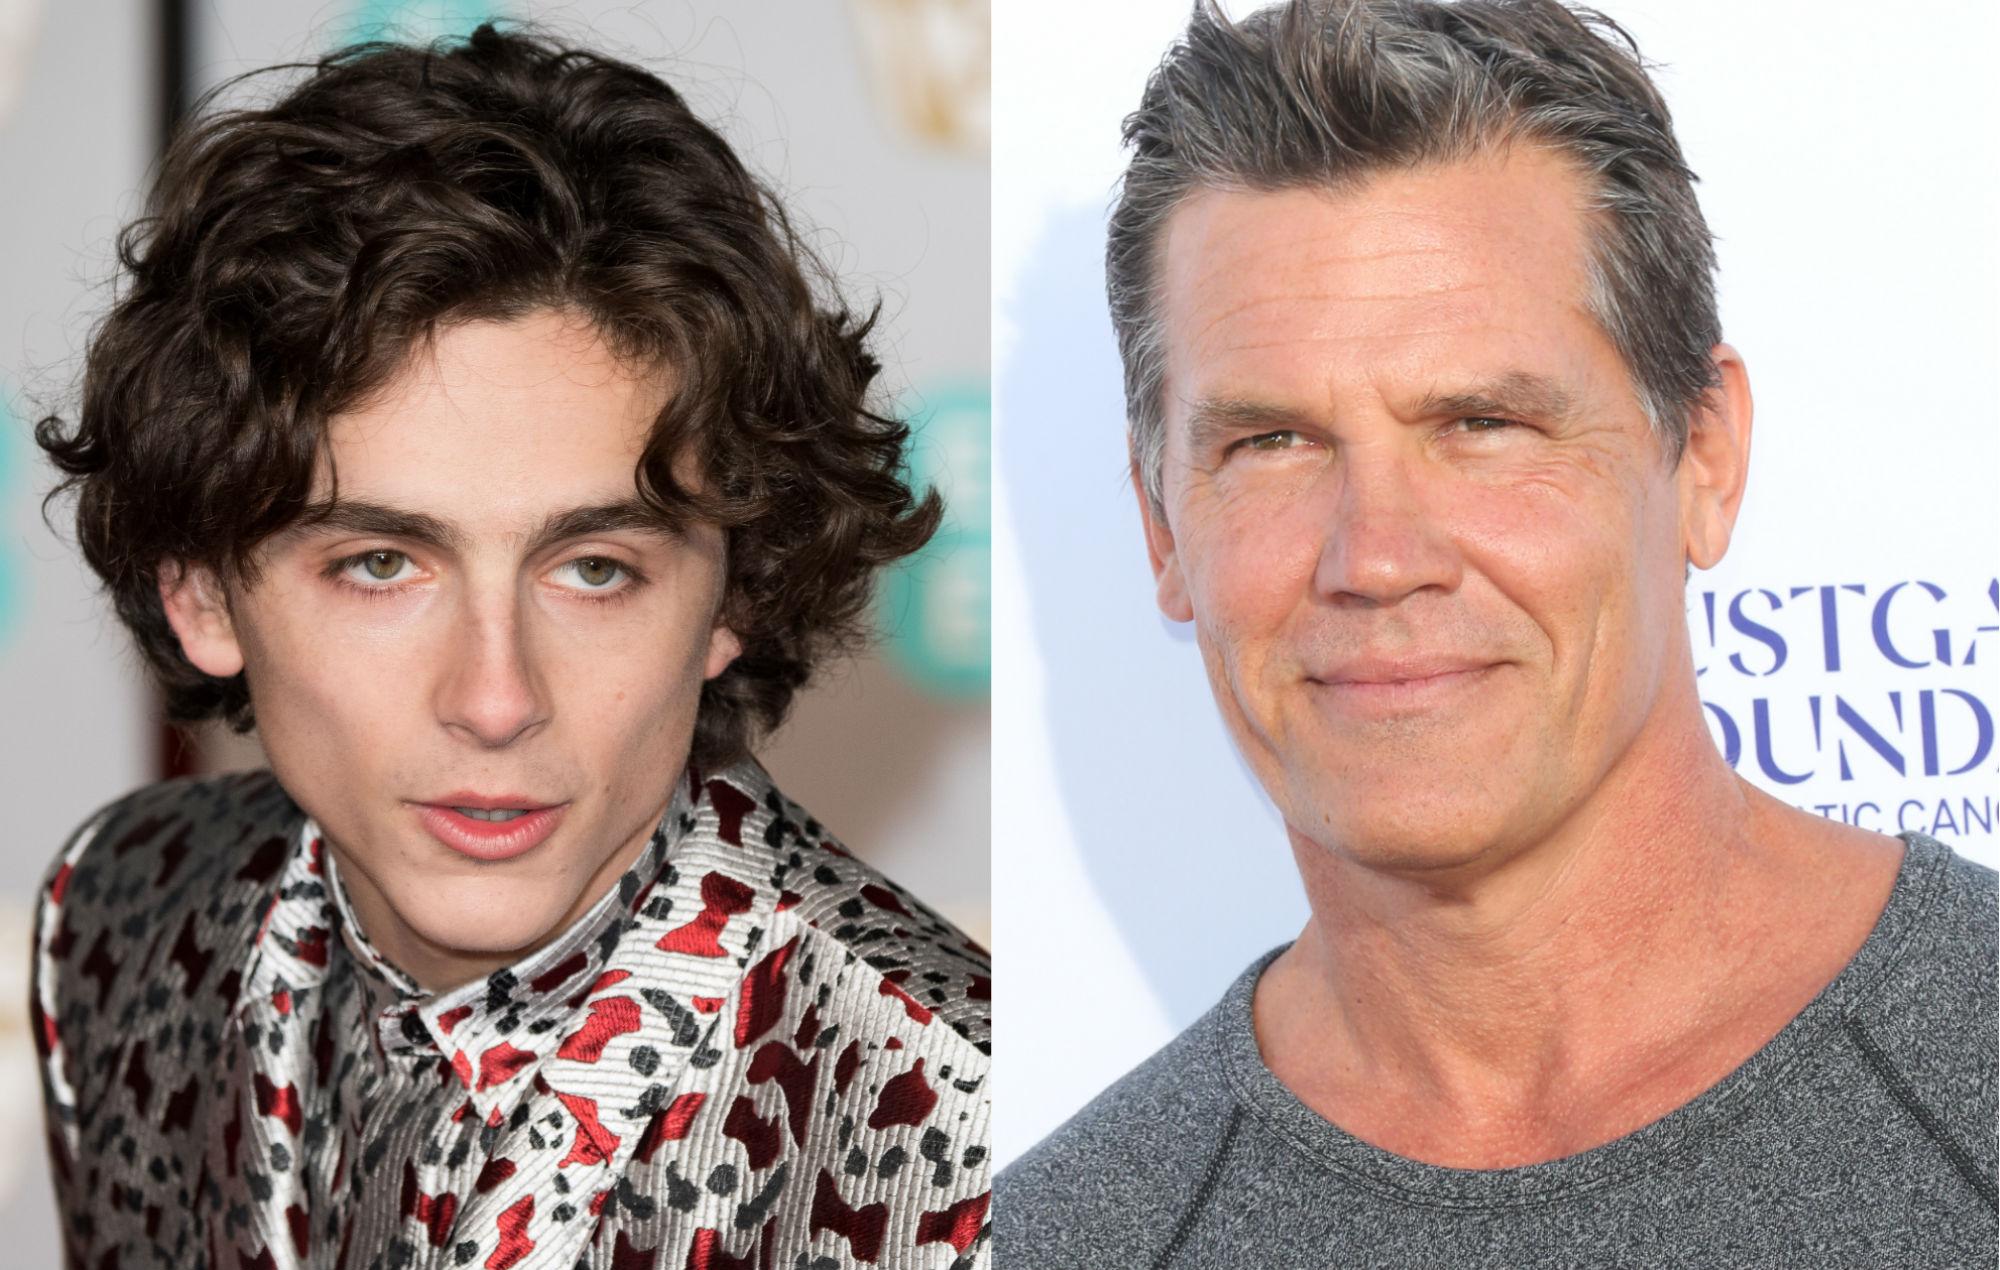 Dune Stars Timothee Chalamet And Josh Brolin Reveal That Filming Has Begun Nme